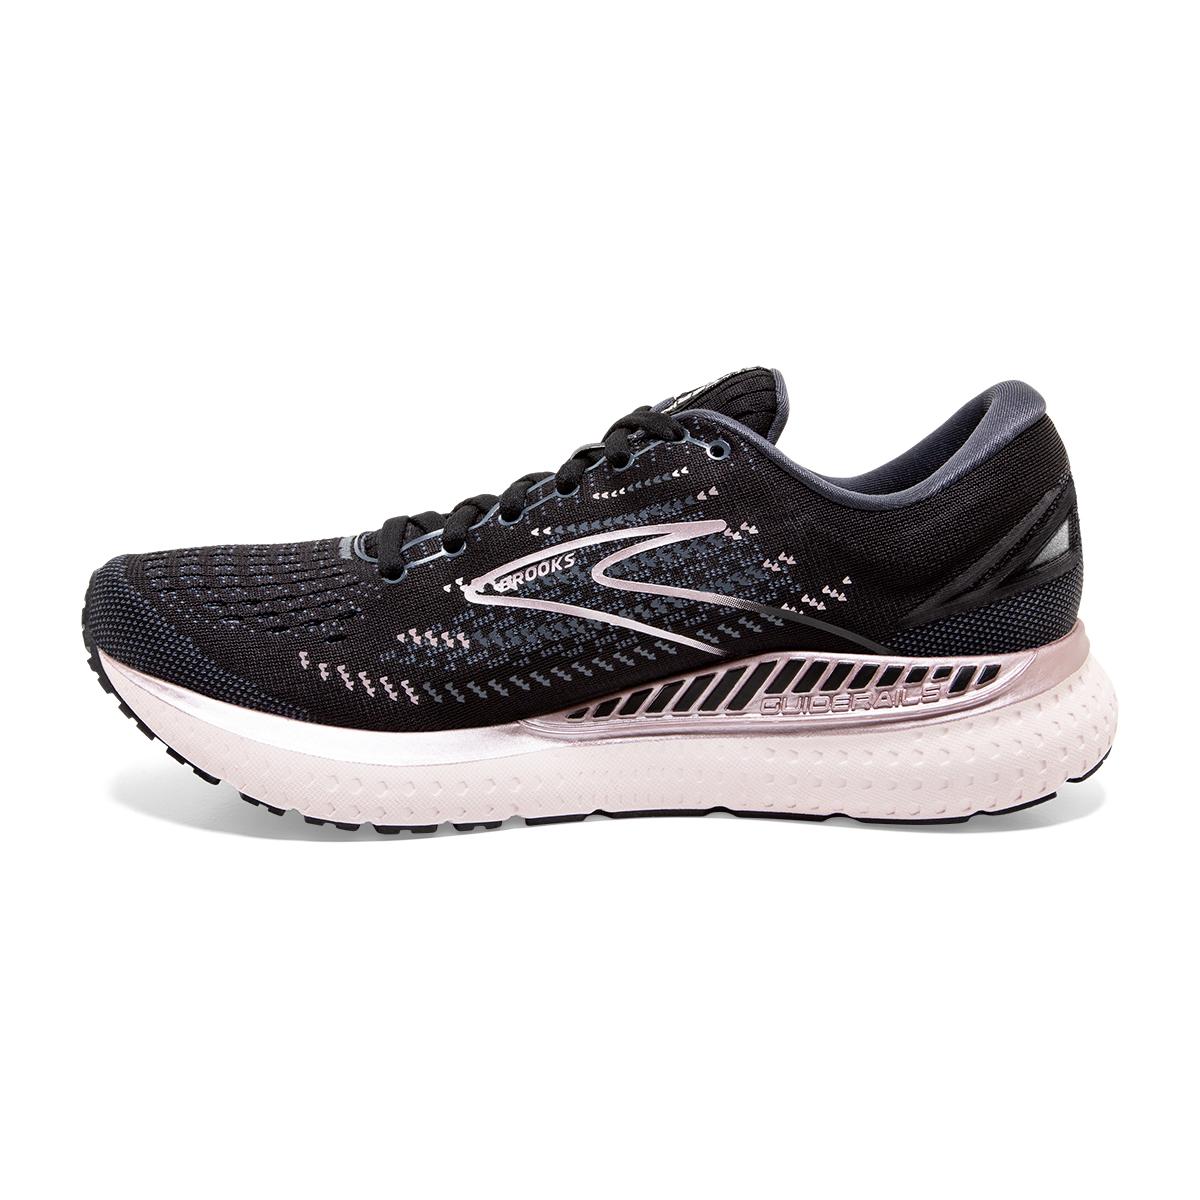 Women's Brooks Glycerin GTS 19 Running Shoe - Color: Black/Ombre/Metallic - Size: 7.5 - Width: Regular, Black/Ombre/Metallic, large, image 5